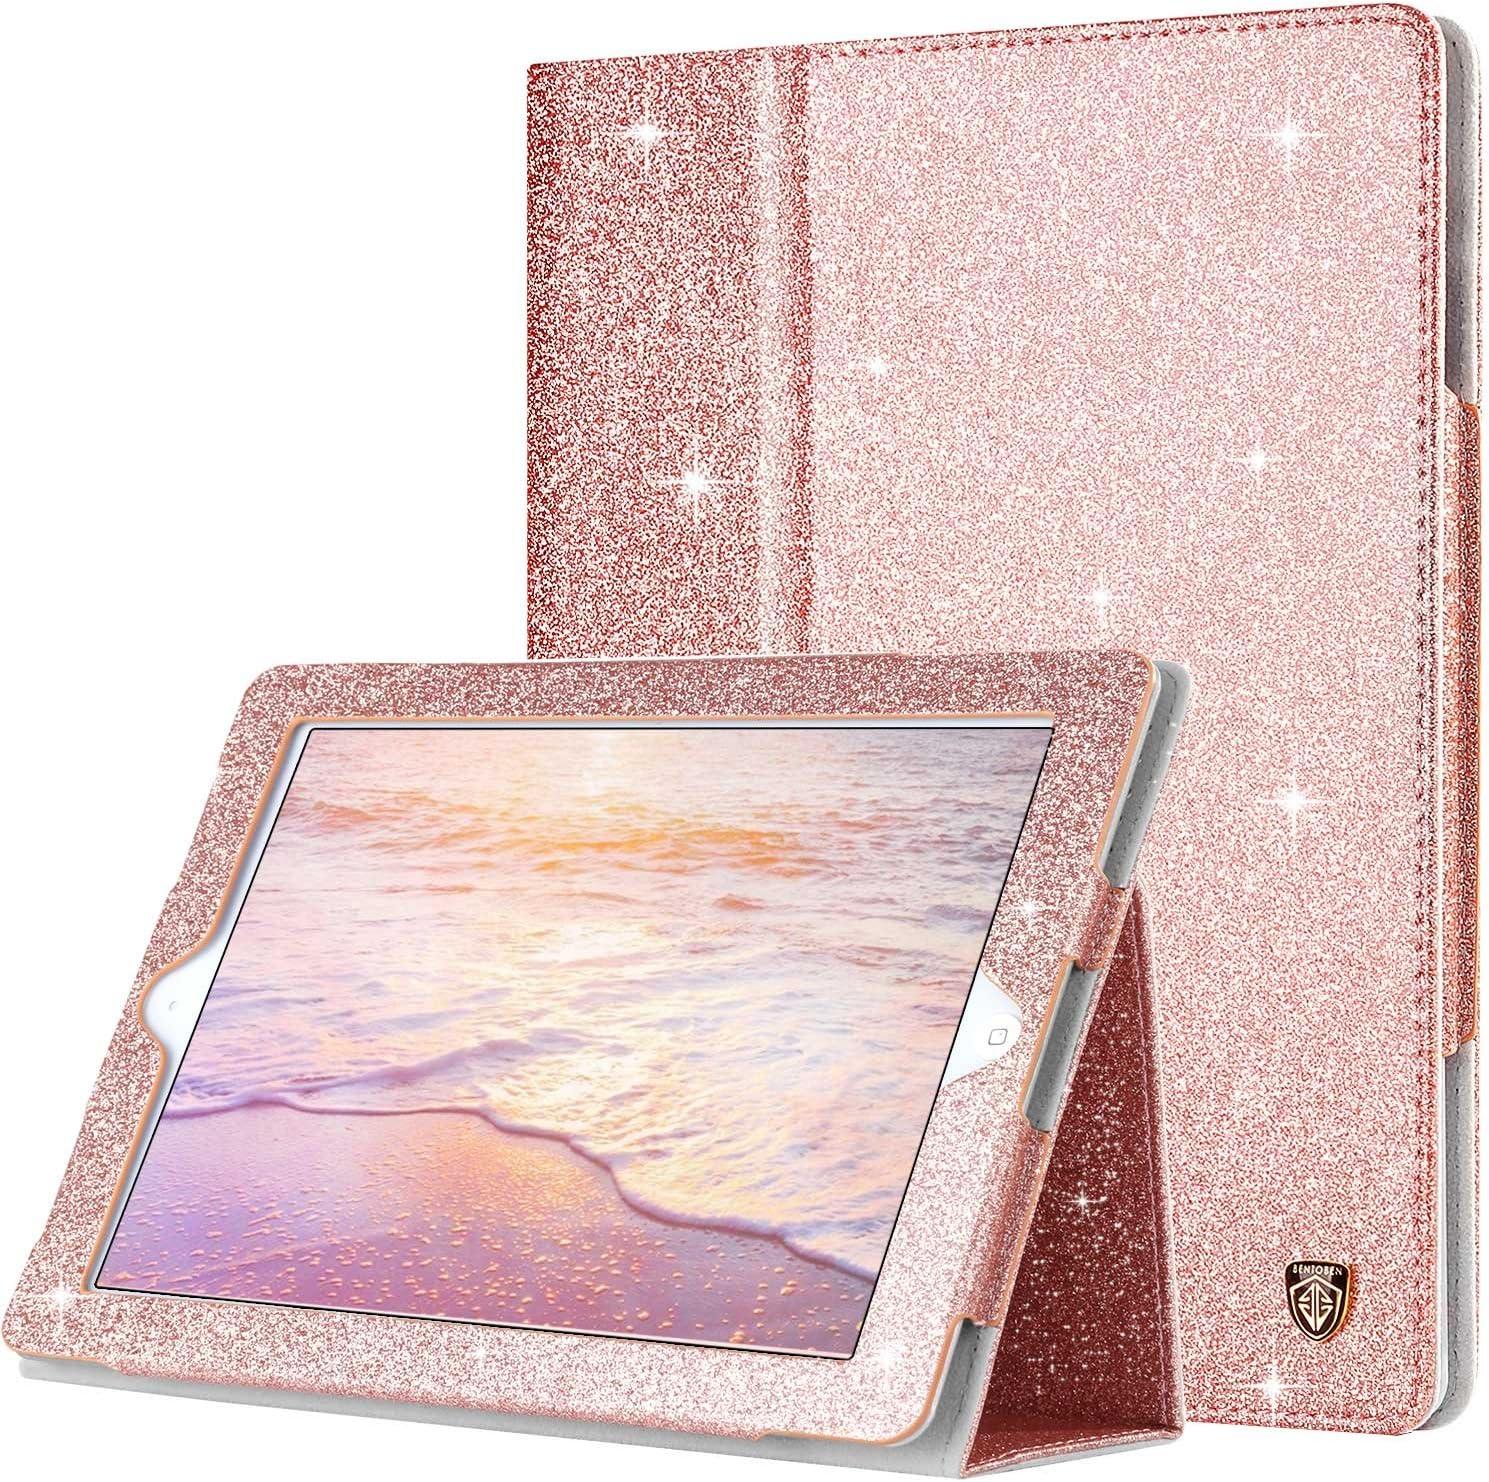 BENTOBEN iPad 2 Case, iPad 3 Case, iPad 4 Case, Glitter Sparkly Slim Lightweight Faux Leather Folio Folding Stand Smart Cover Stylus Holder Auto Wake/Sleep Protective Case for iPad 2/3/4, Rose Gold